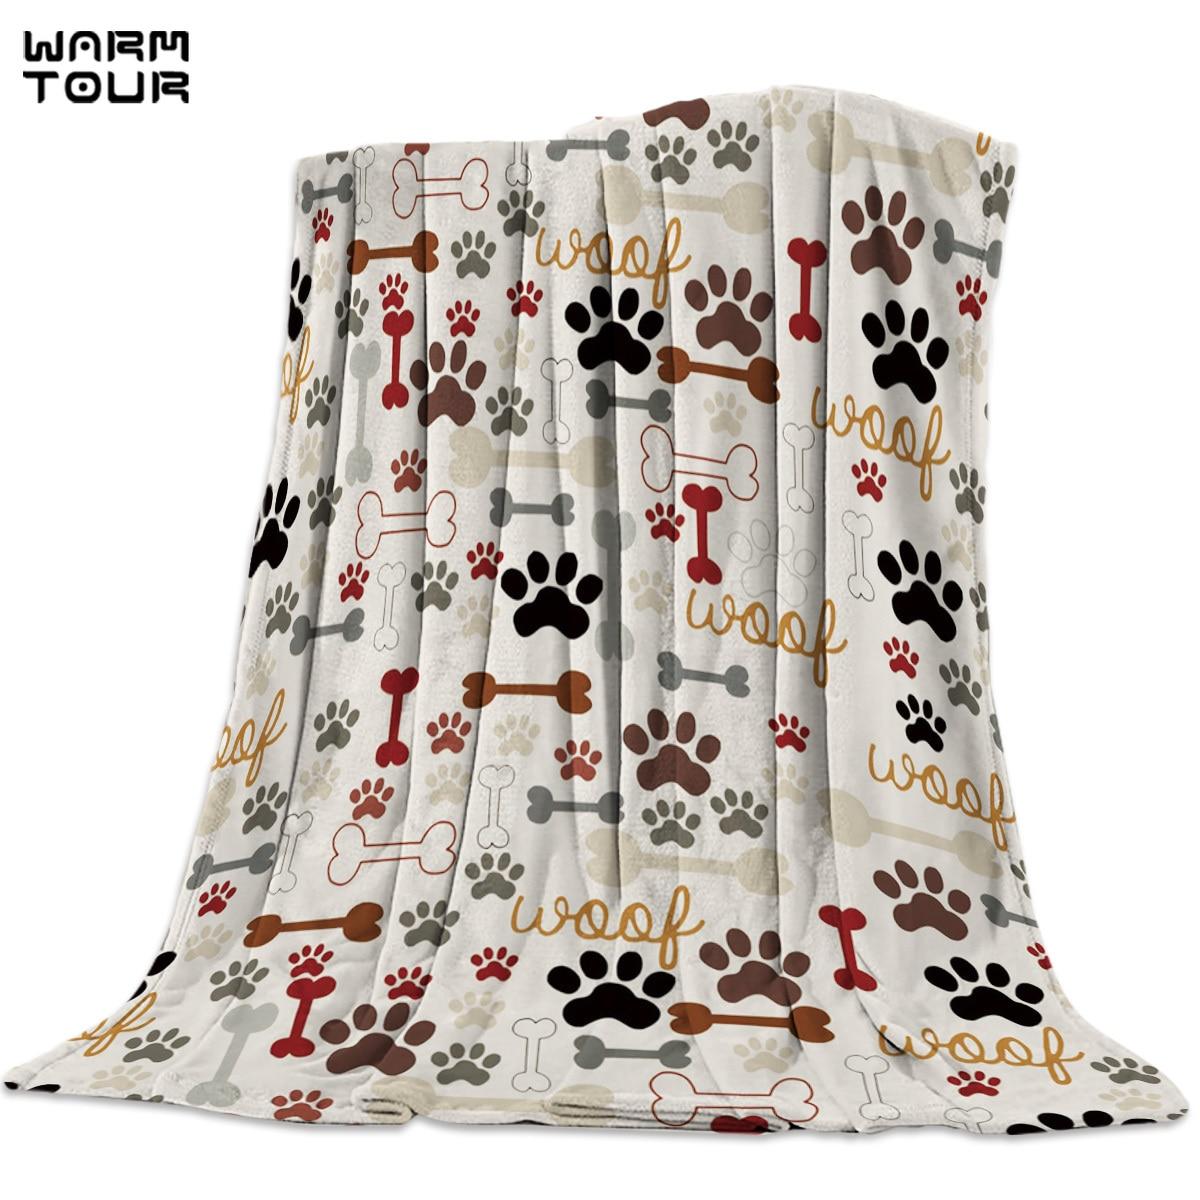 Dibujos Animados perro huellas huesos animales manta divertido impreso suave niño niña bebé Coral polar animales mantas cálido sofá cama sábanas